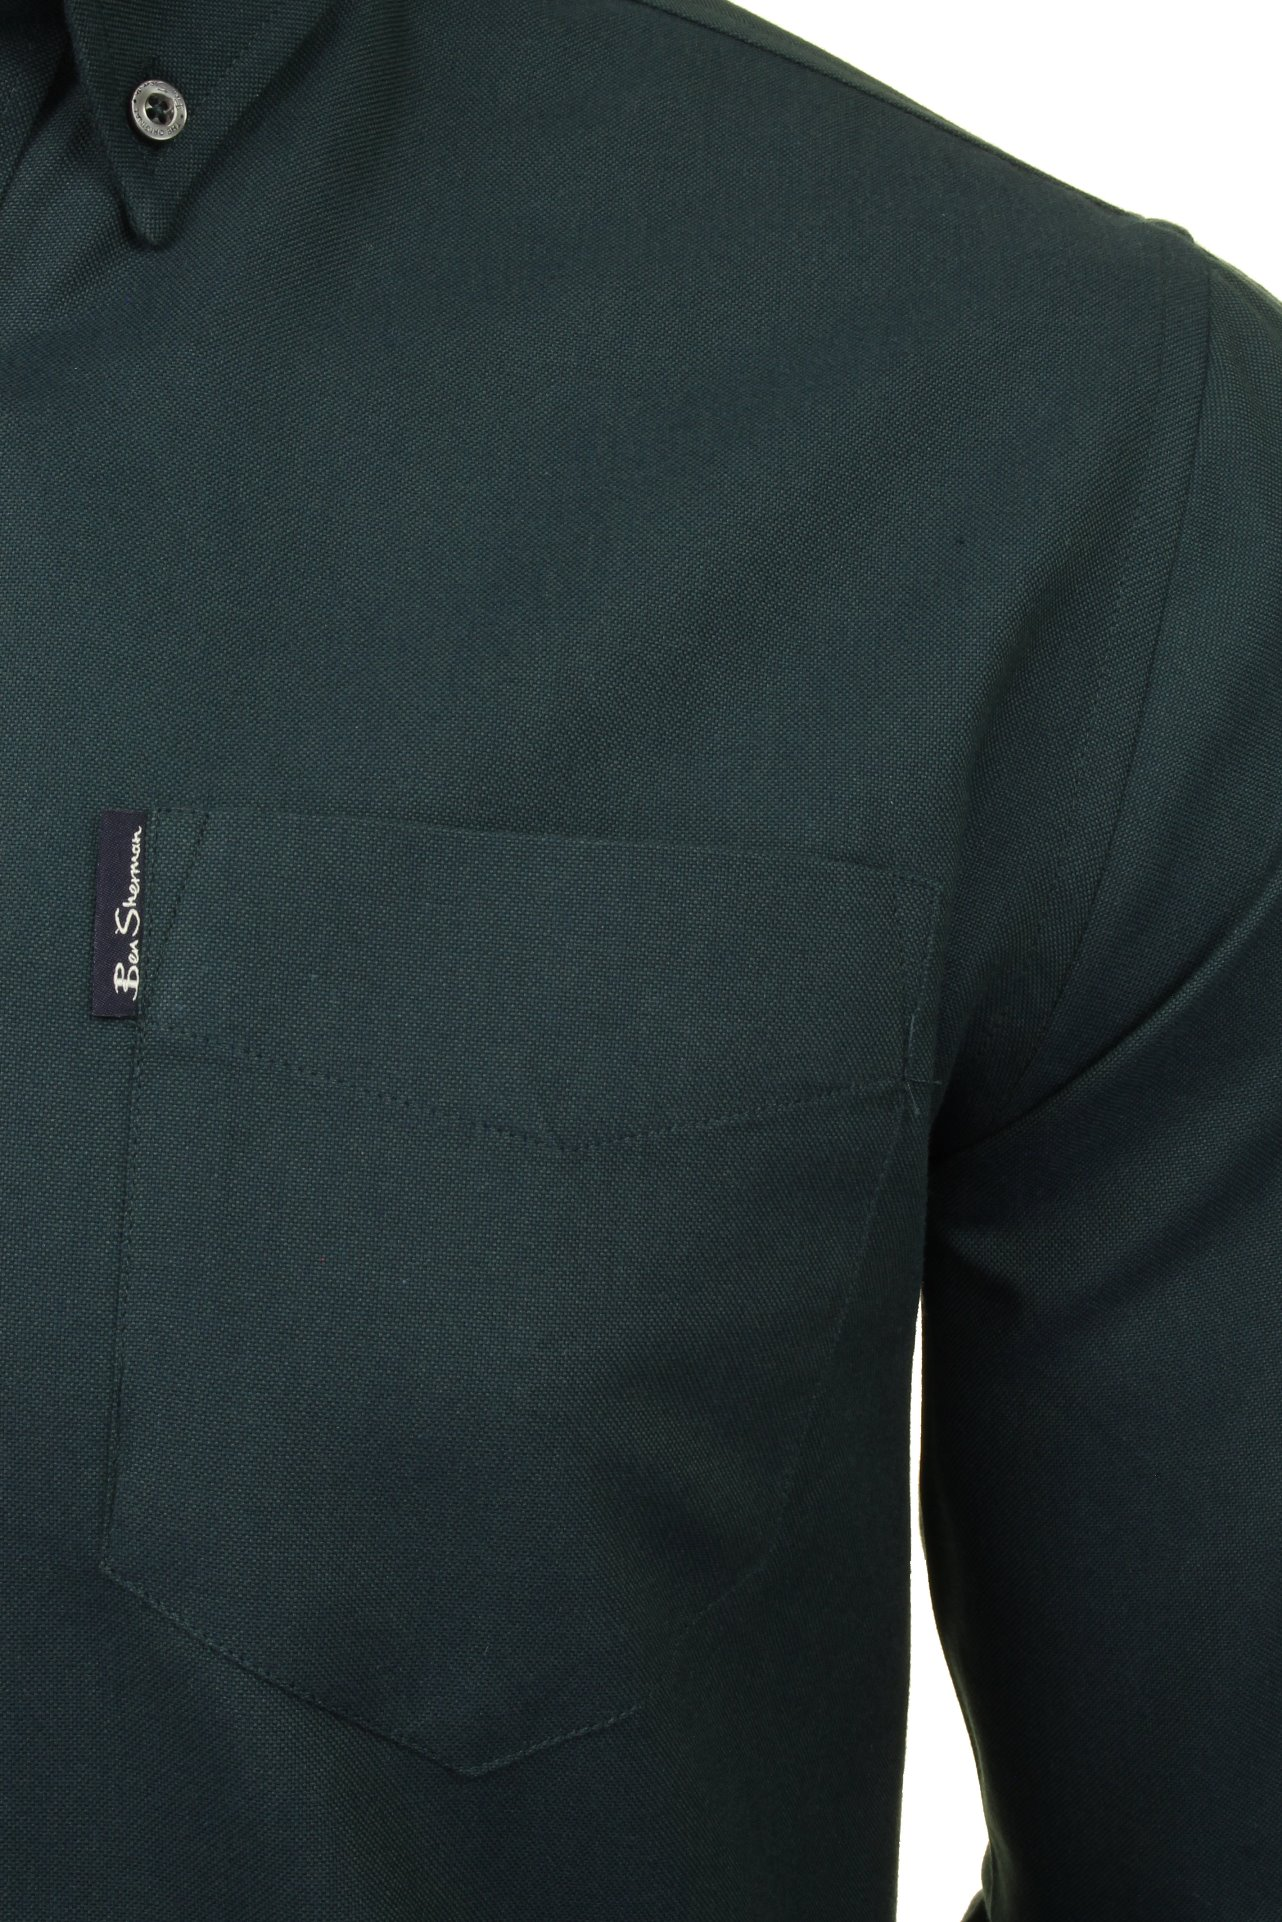 Mens-Oxford-Shirt-by-Ben-Sherman-Long-Sleeved miniatuur 24